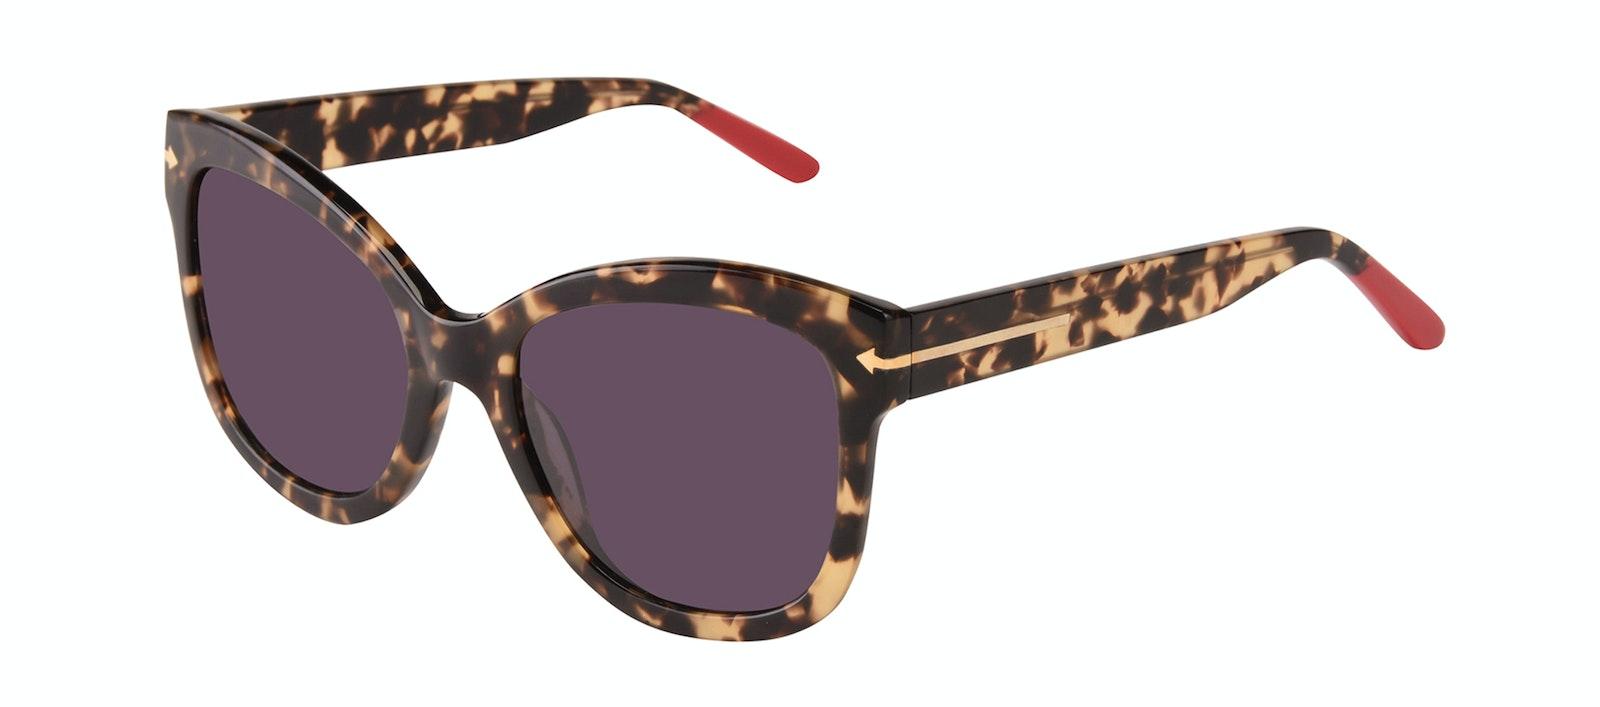 Affordable Fashion Glasses Square Sunglasses Women Marlo Espresso Tilt